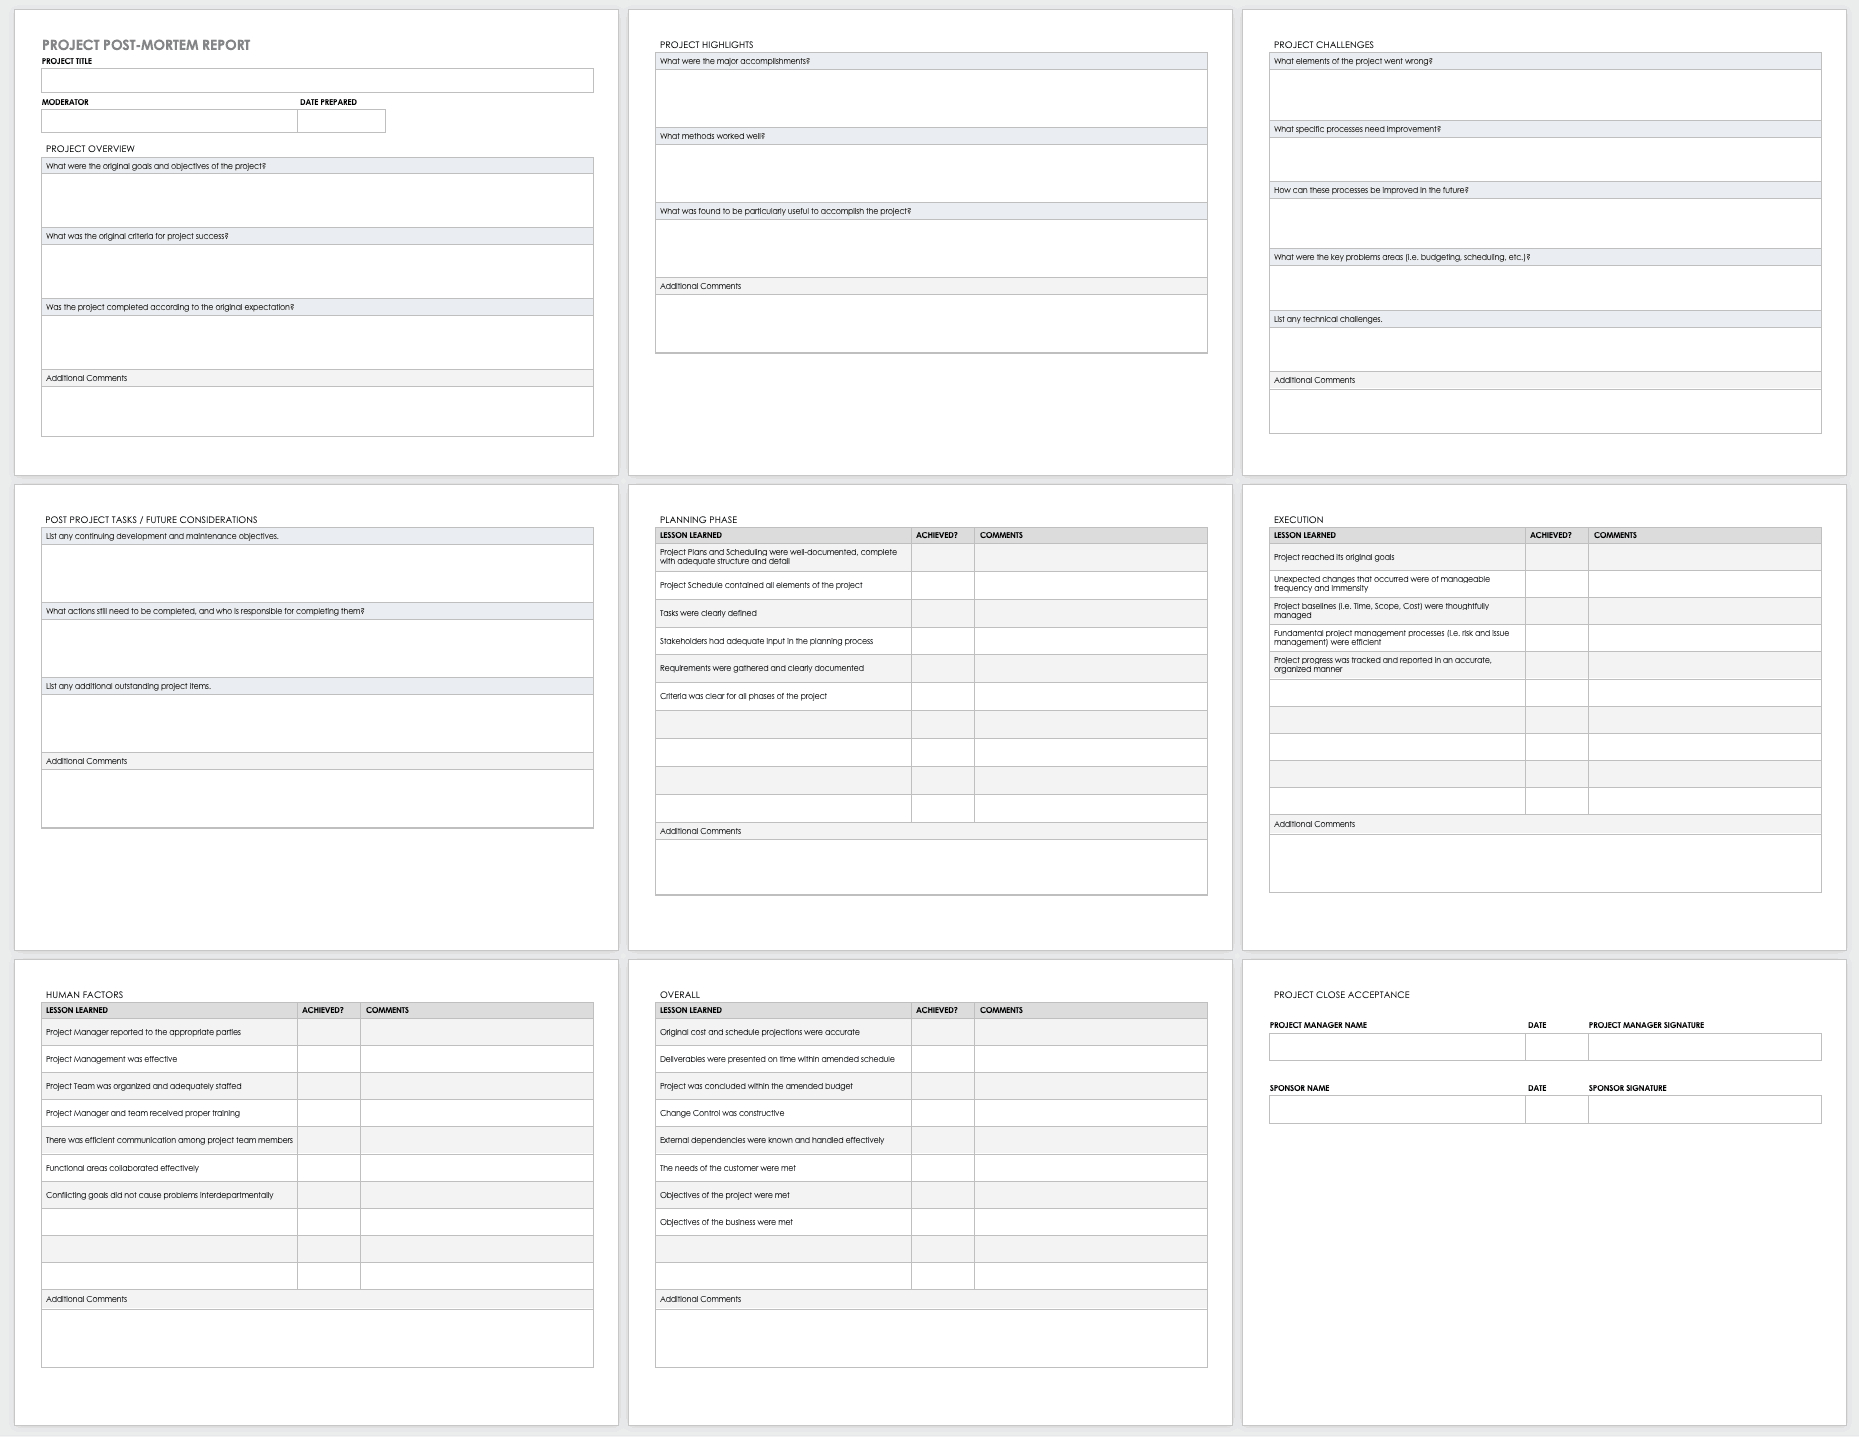 Free Project Report Templates | Smartsheet In Post Project Report Template